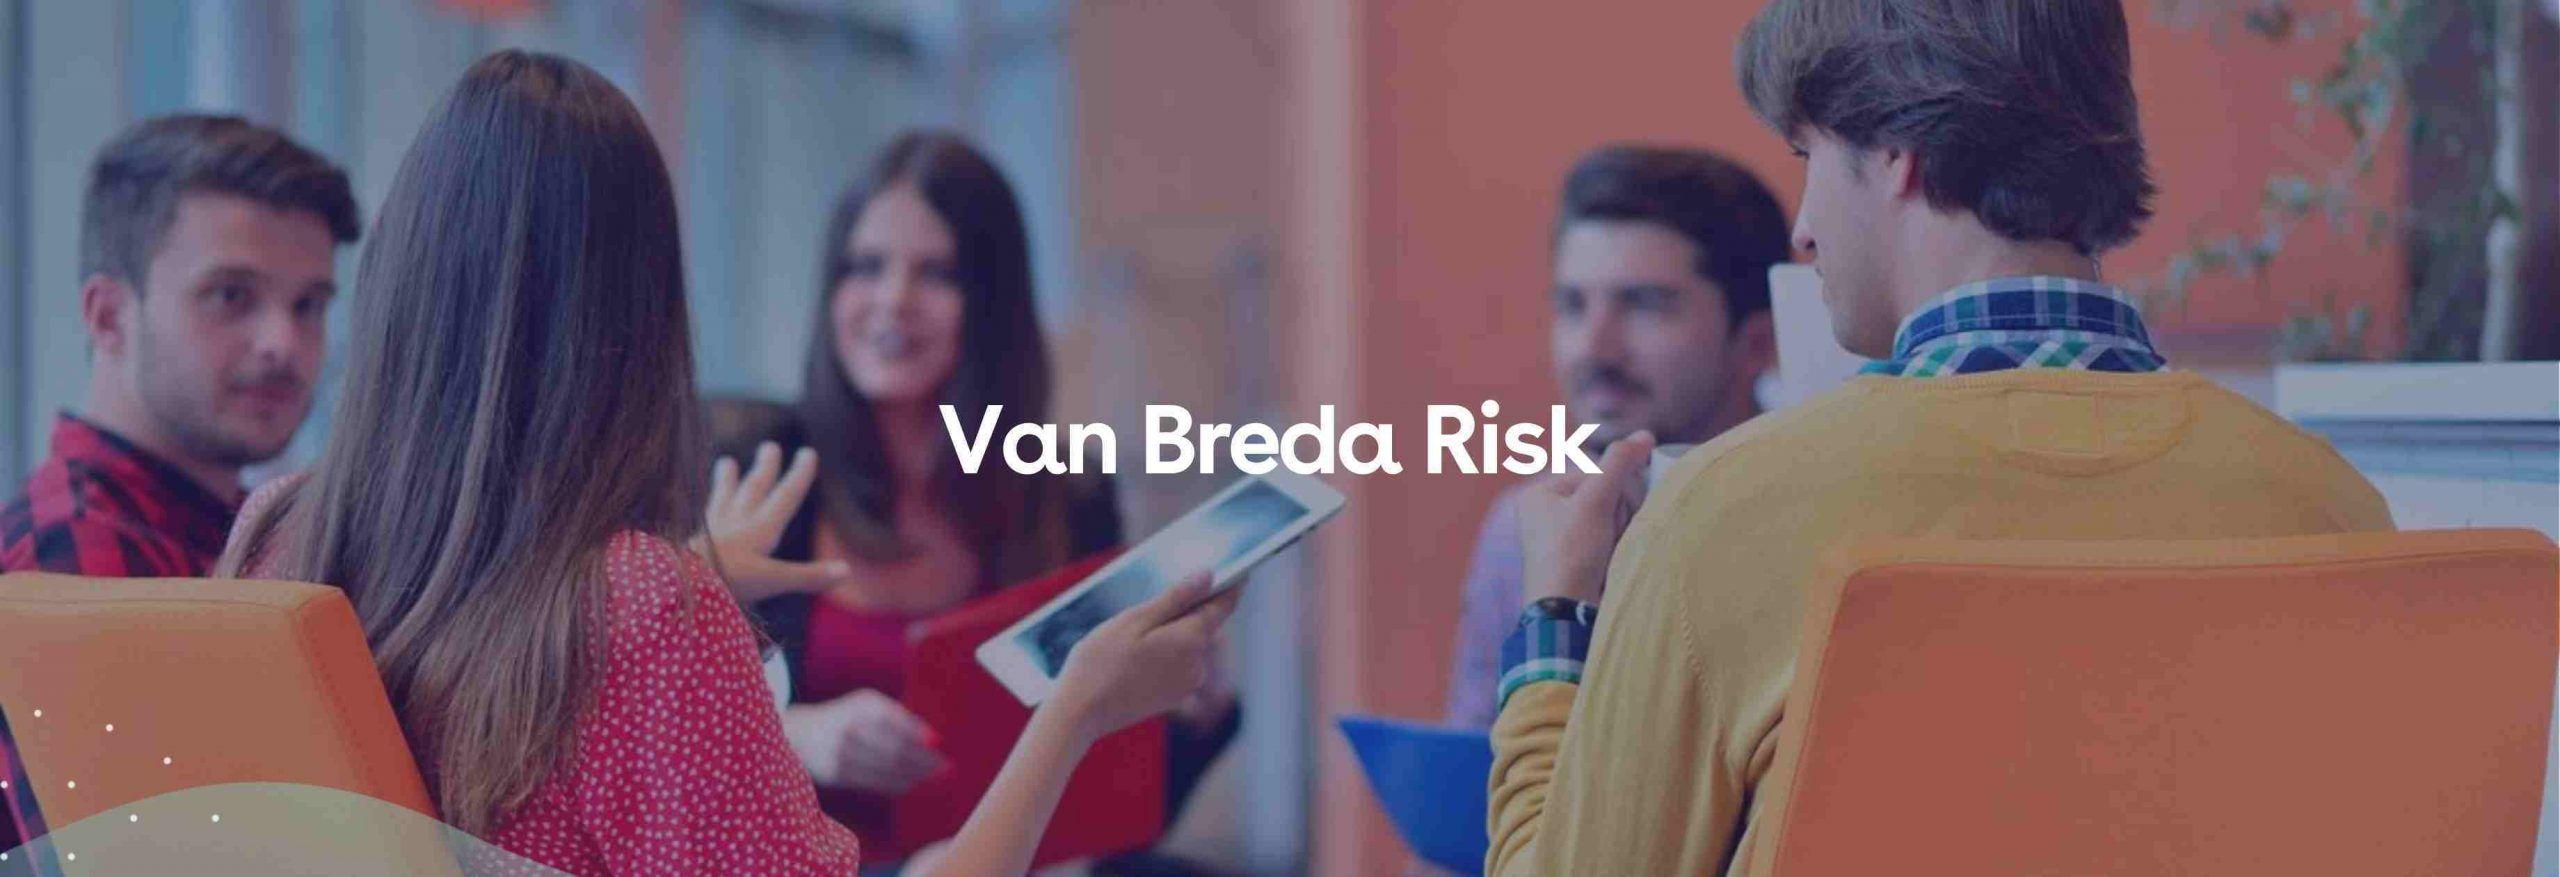 Van Breda Risk